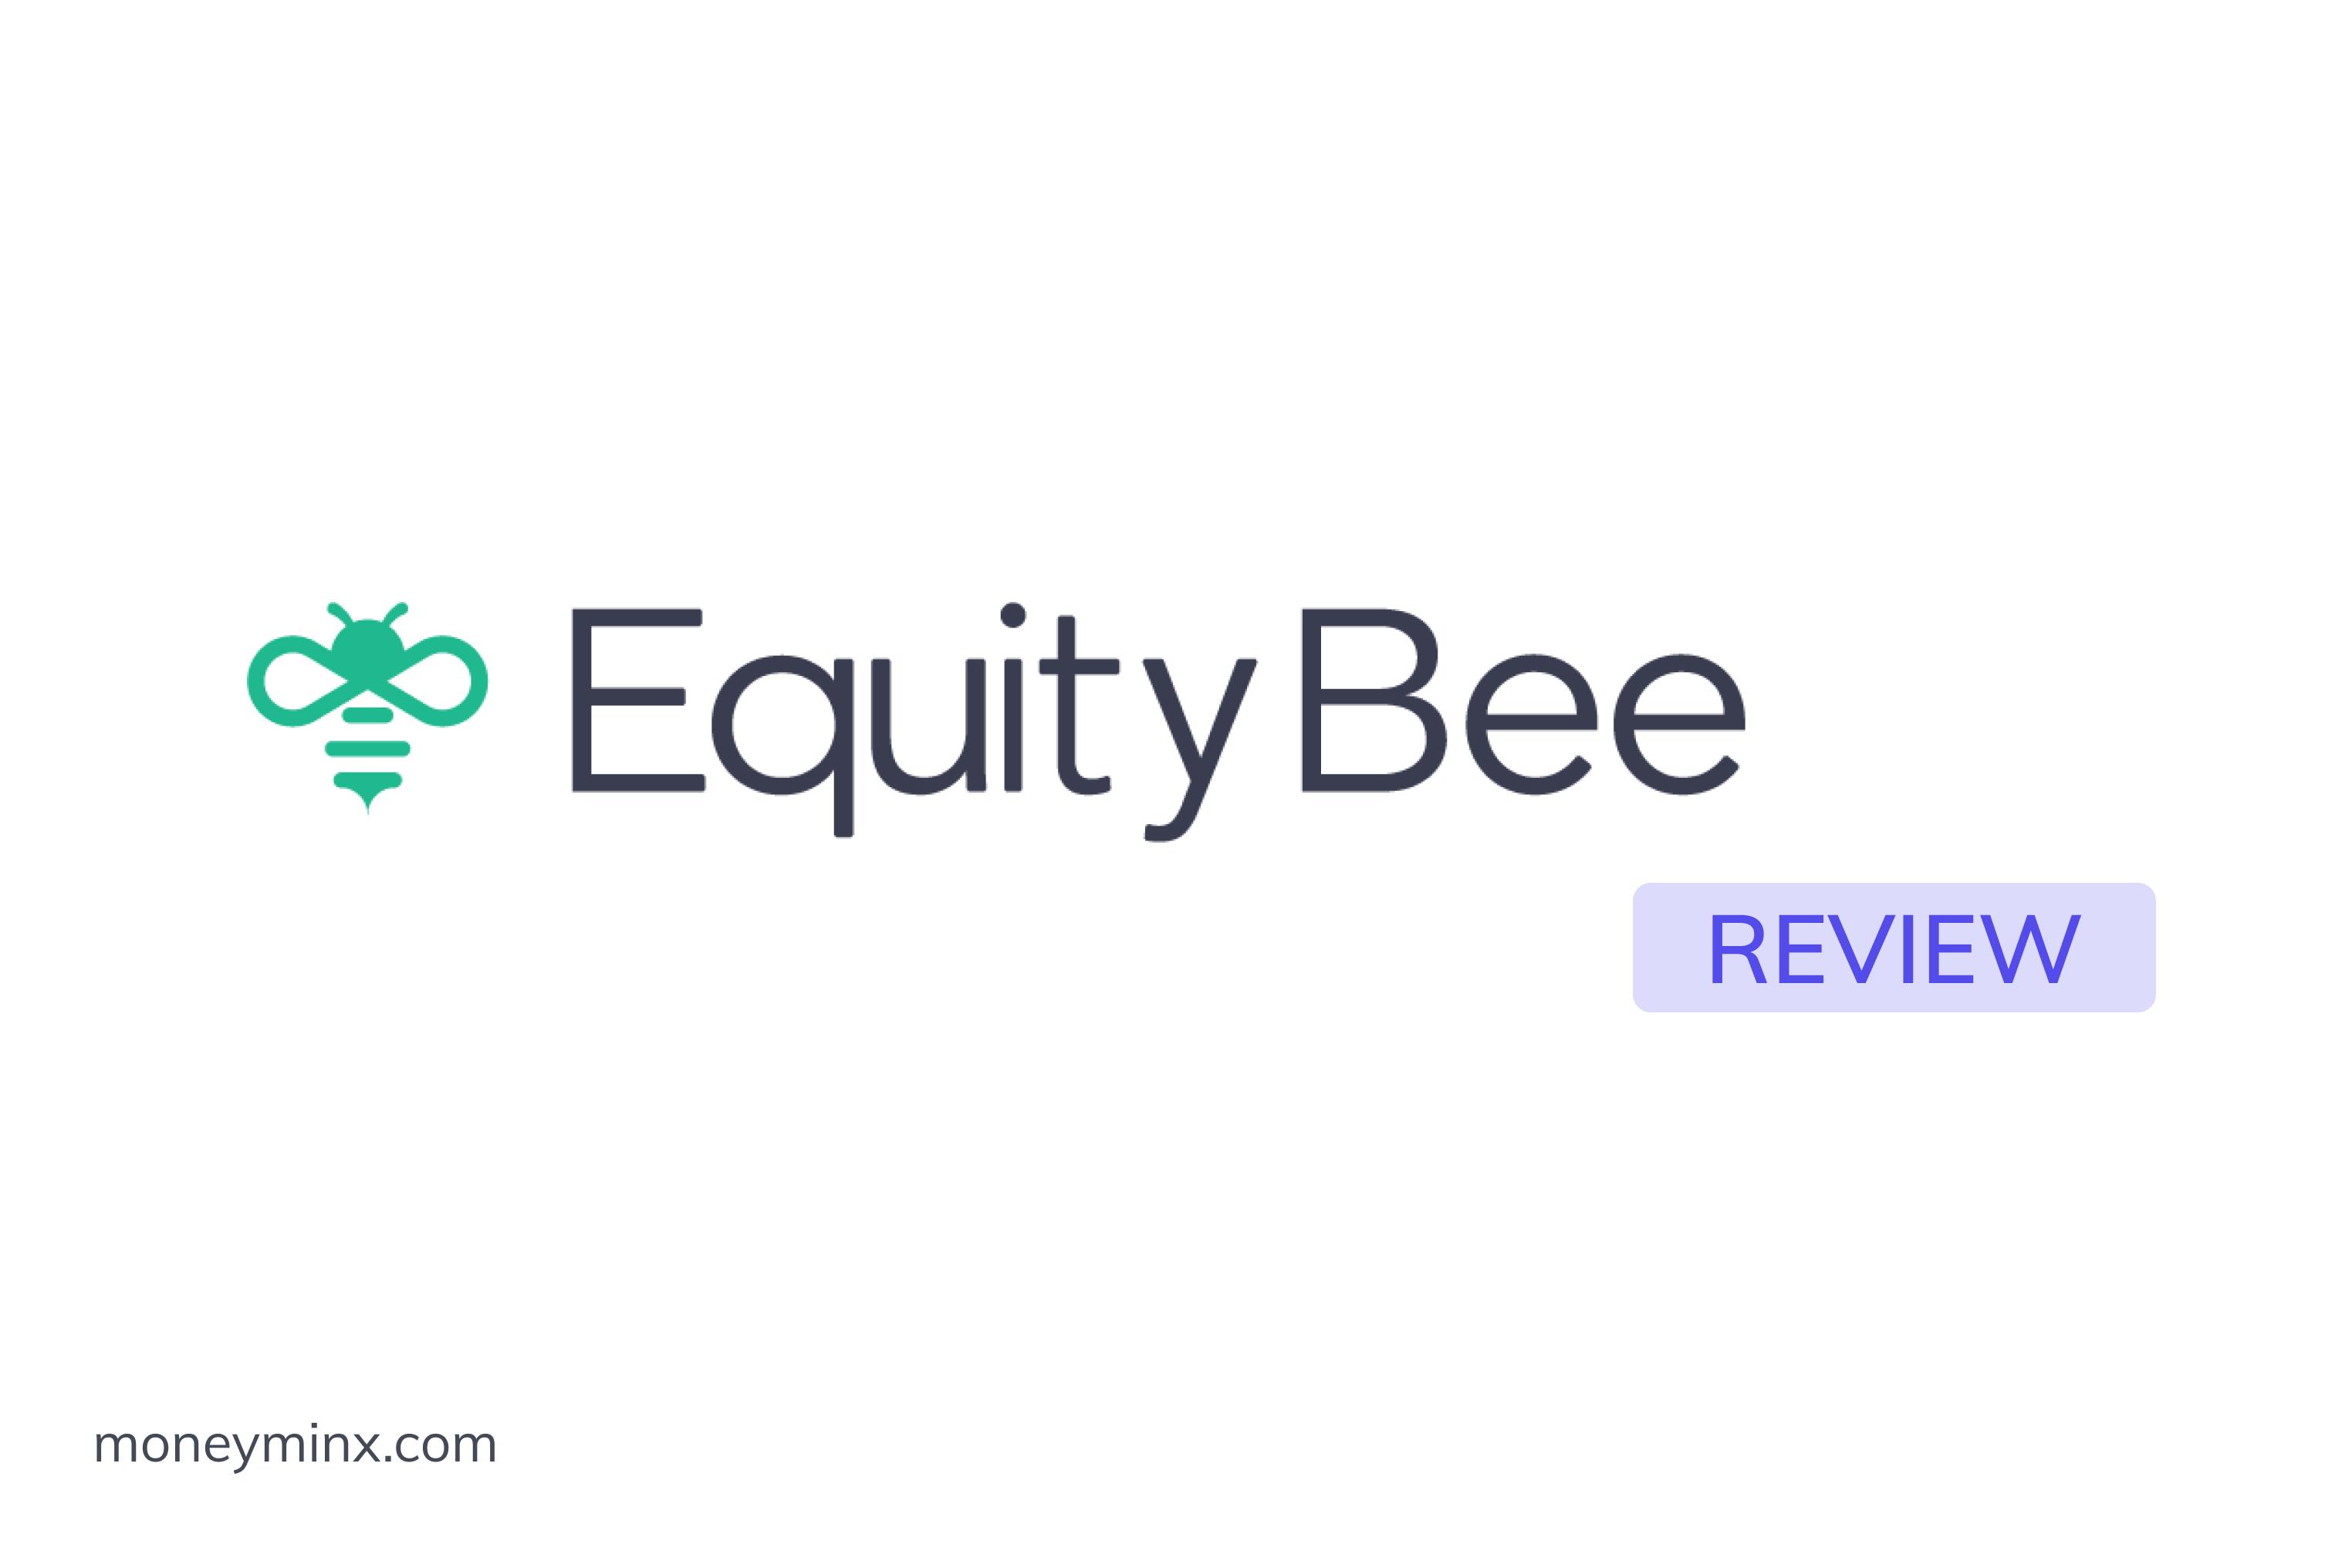 EquityBee Review